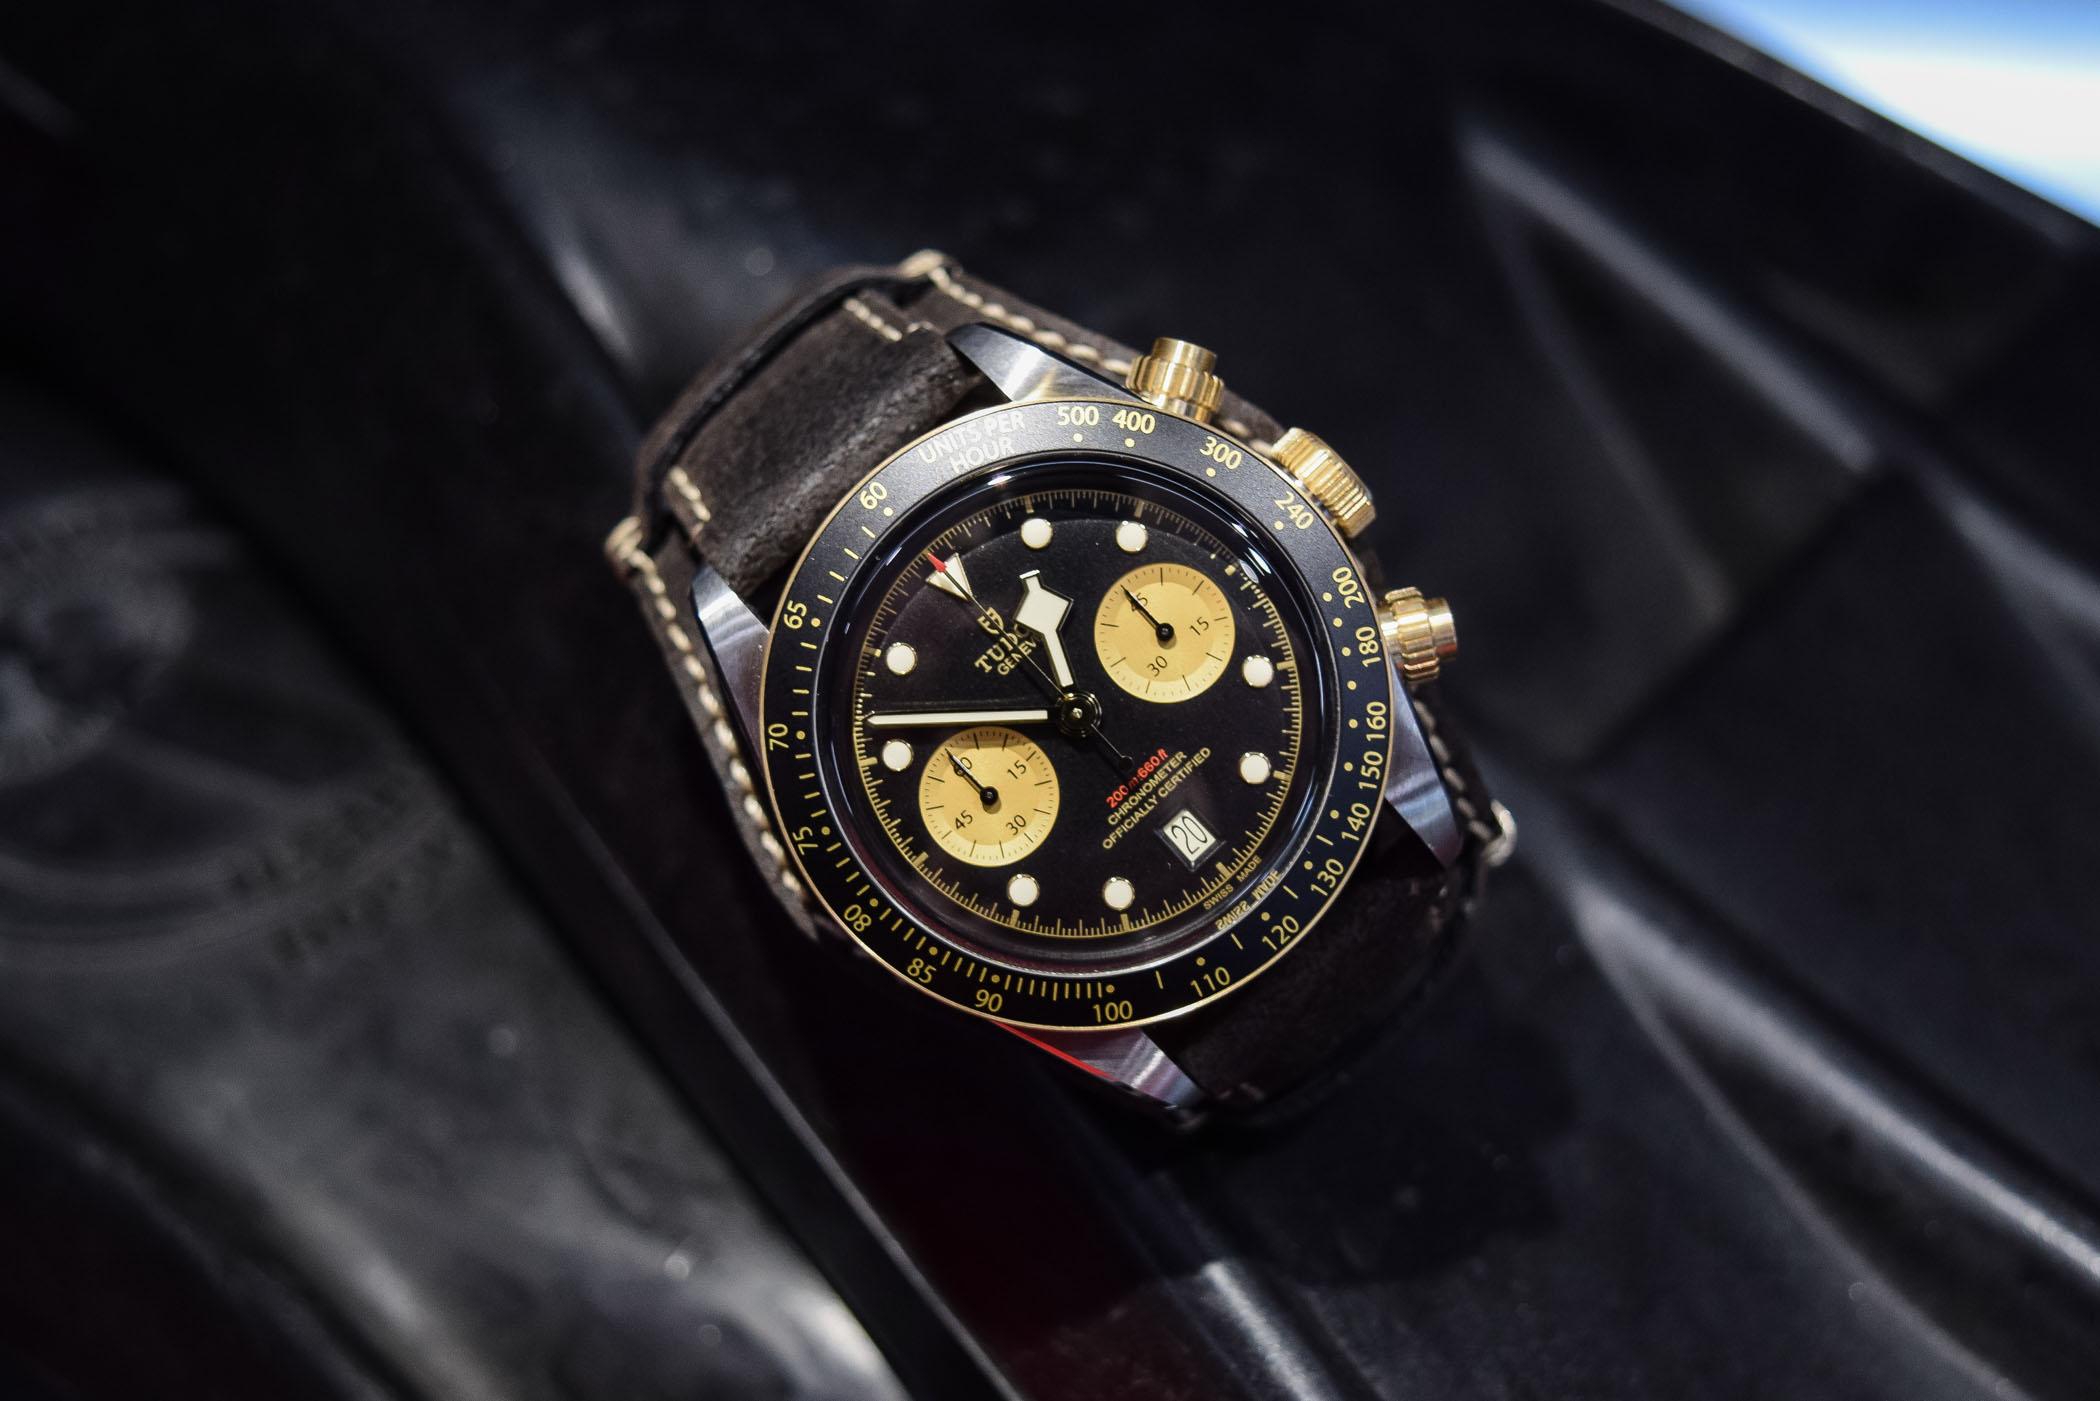 Baselworld 2019 - Tudor Black Bay Chrono steel and gold 79363N - 6